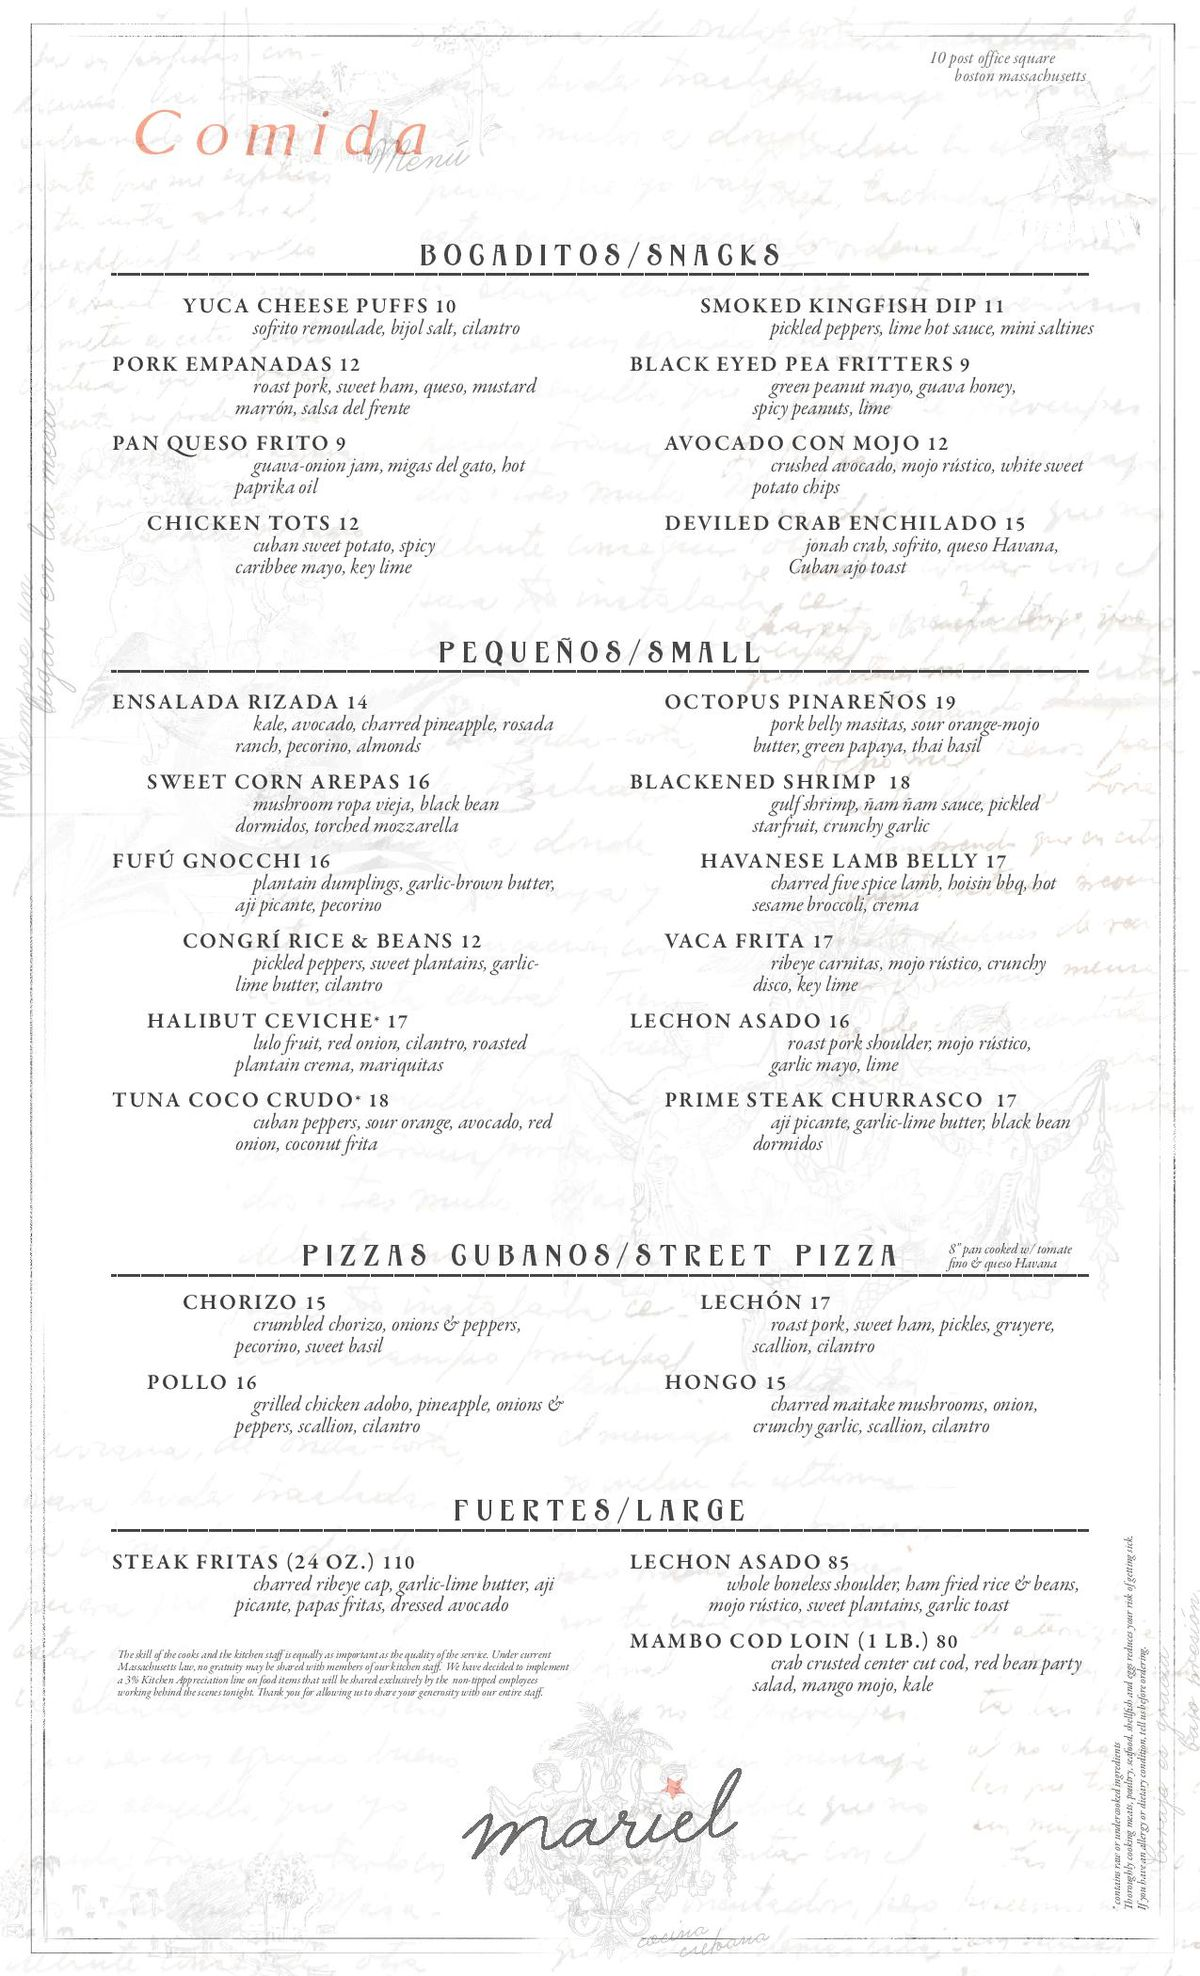 mariel dinner menu